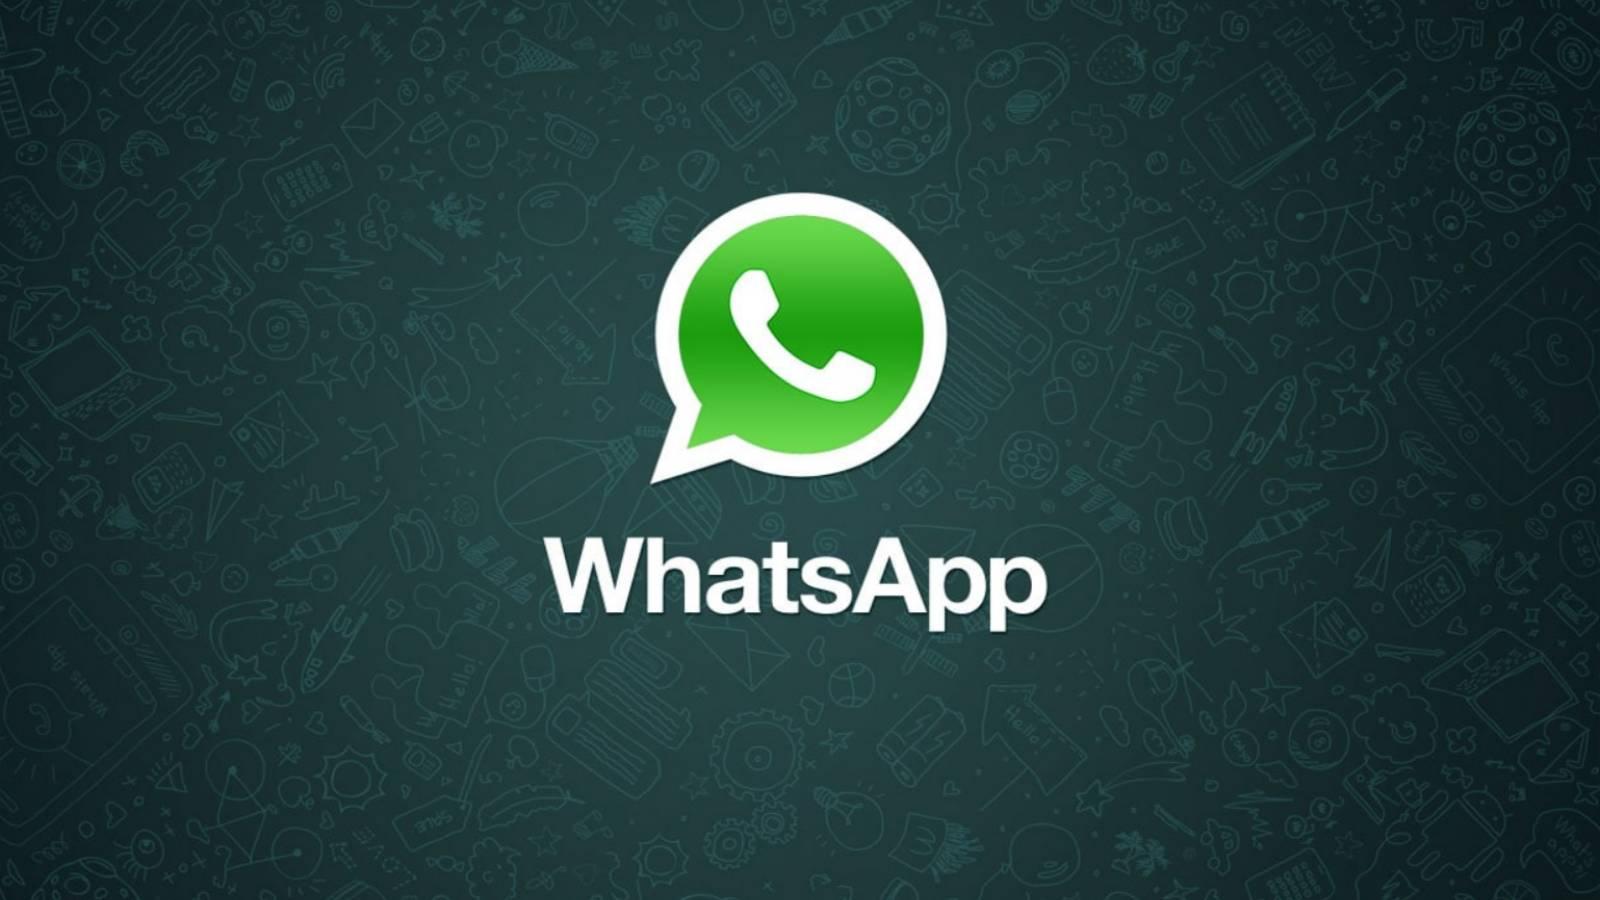 WhatsApp rooms